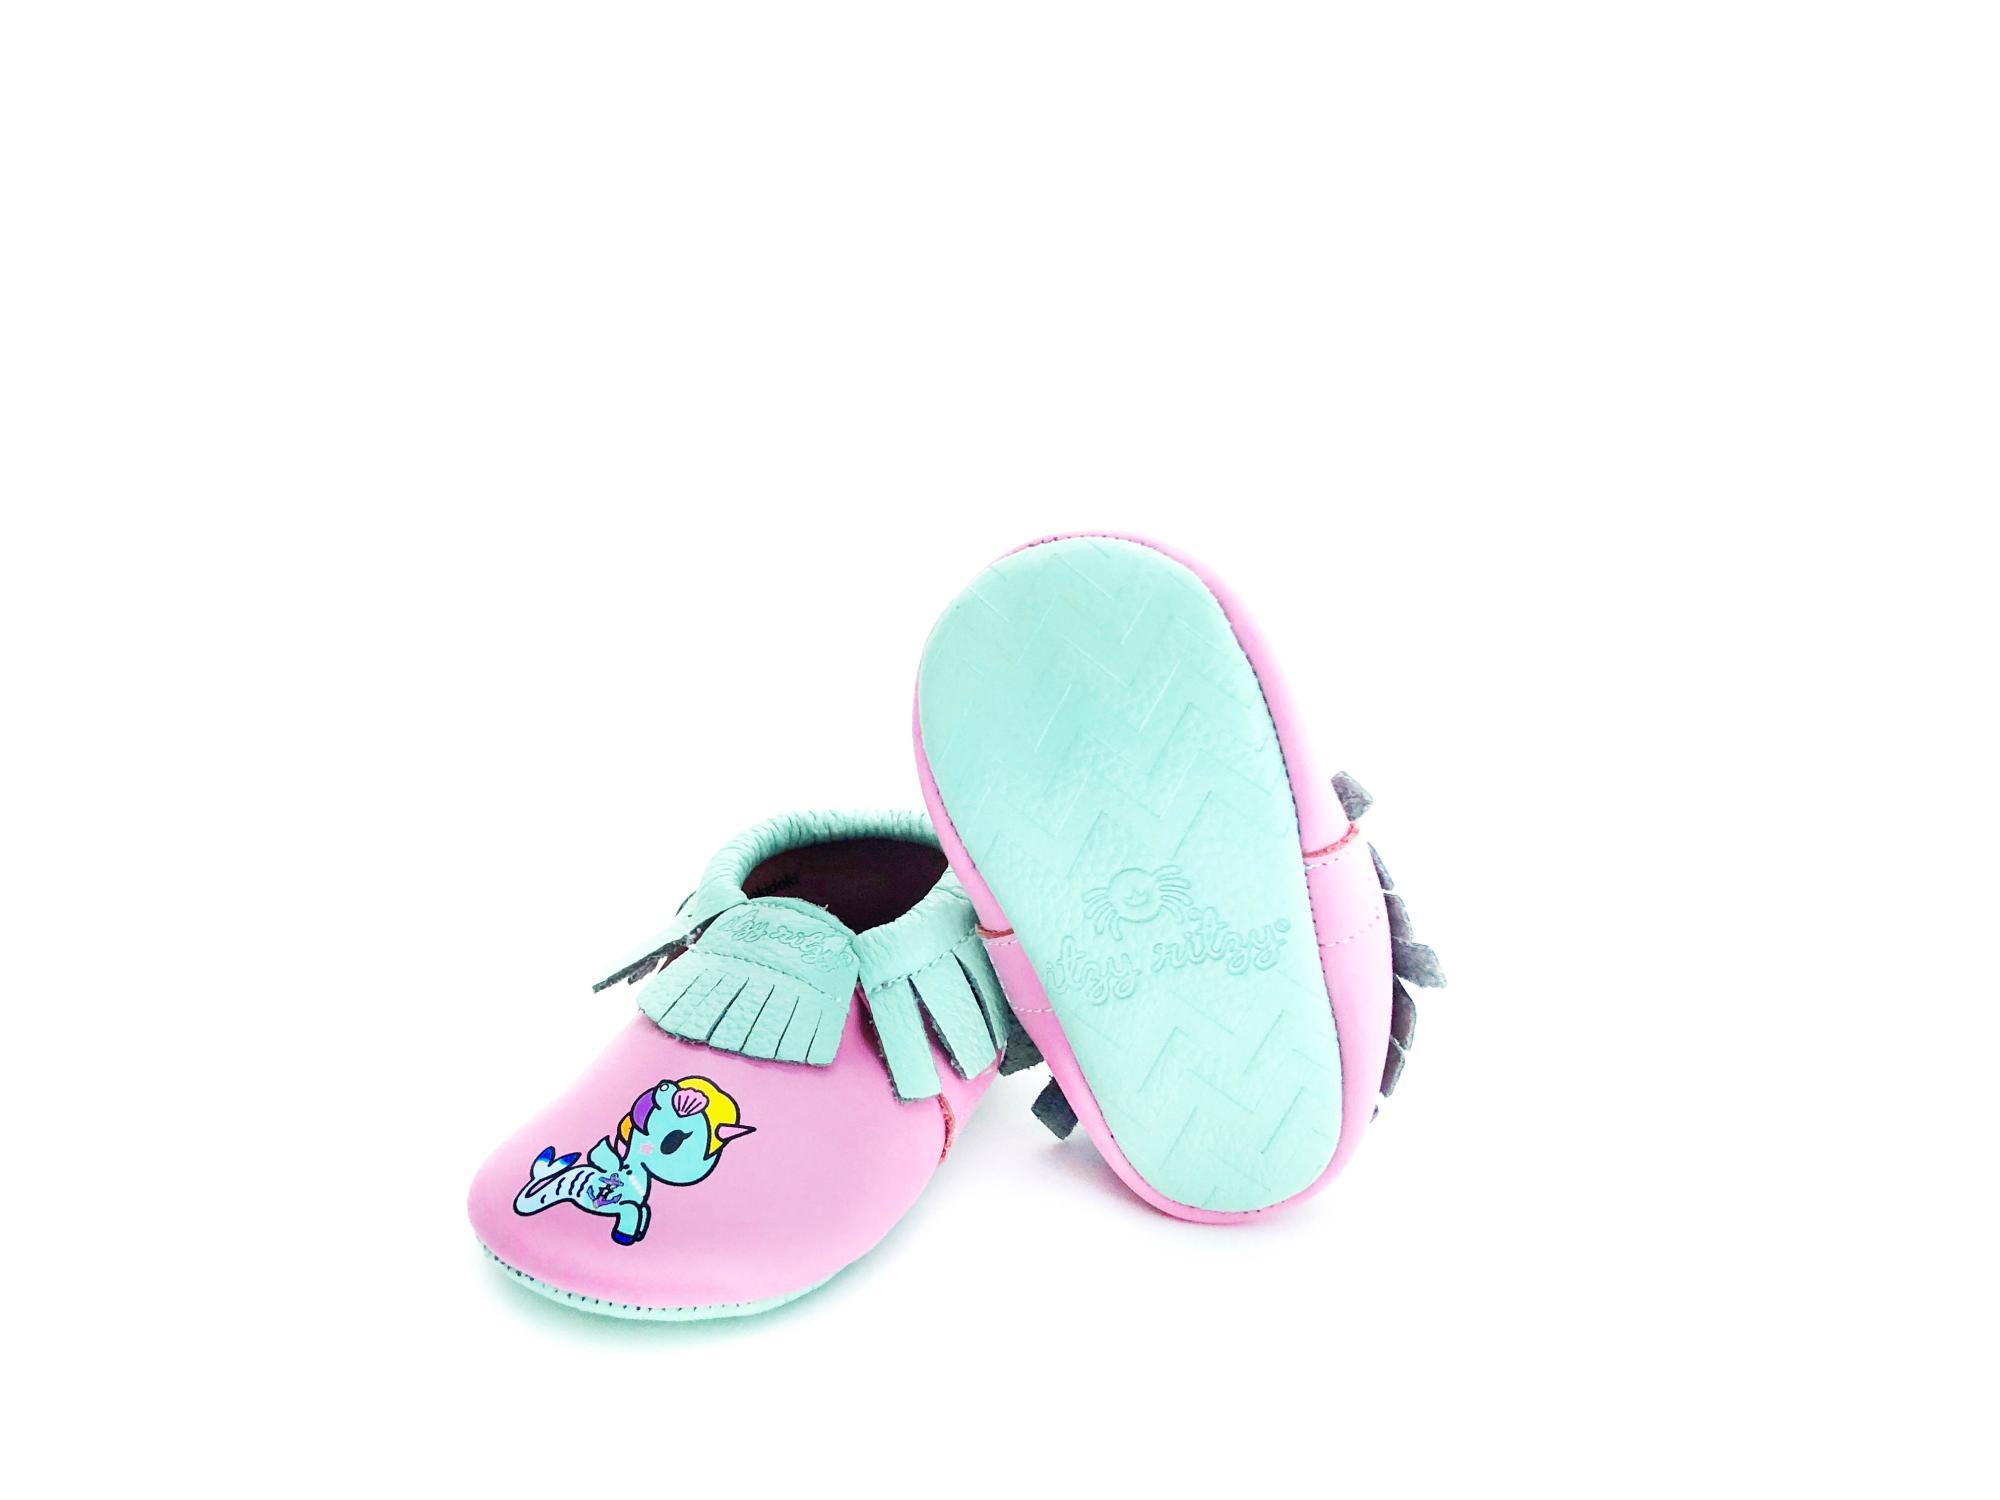 itzy-ritzy-tokidoki-moc-happens-baby-moccasins-sirena-unicorn-3.jpg